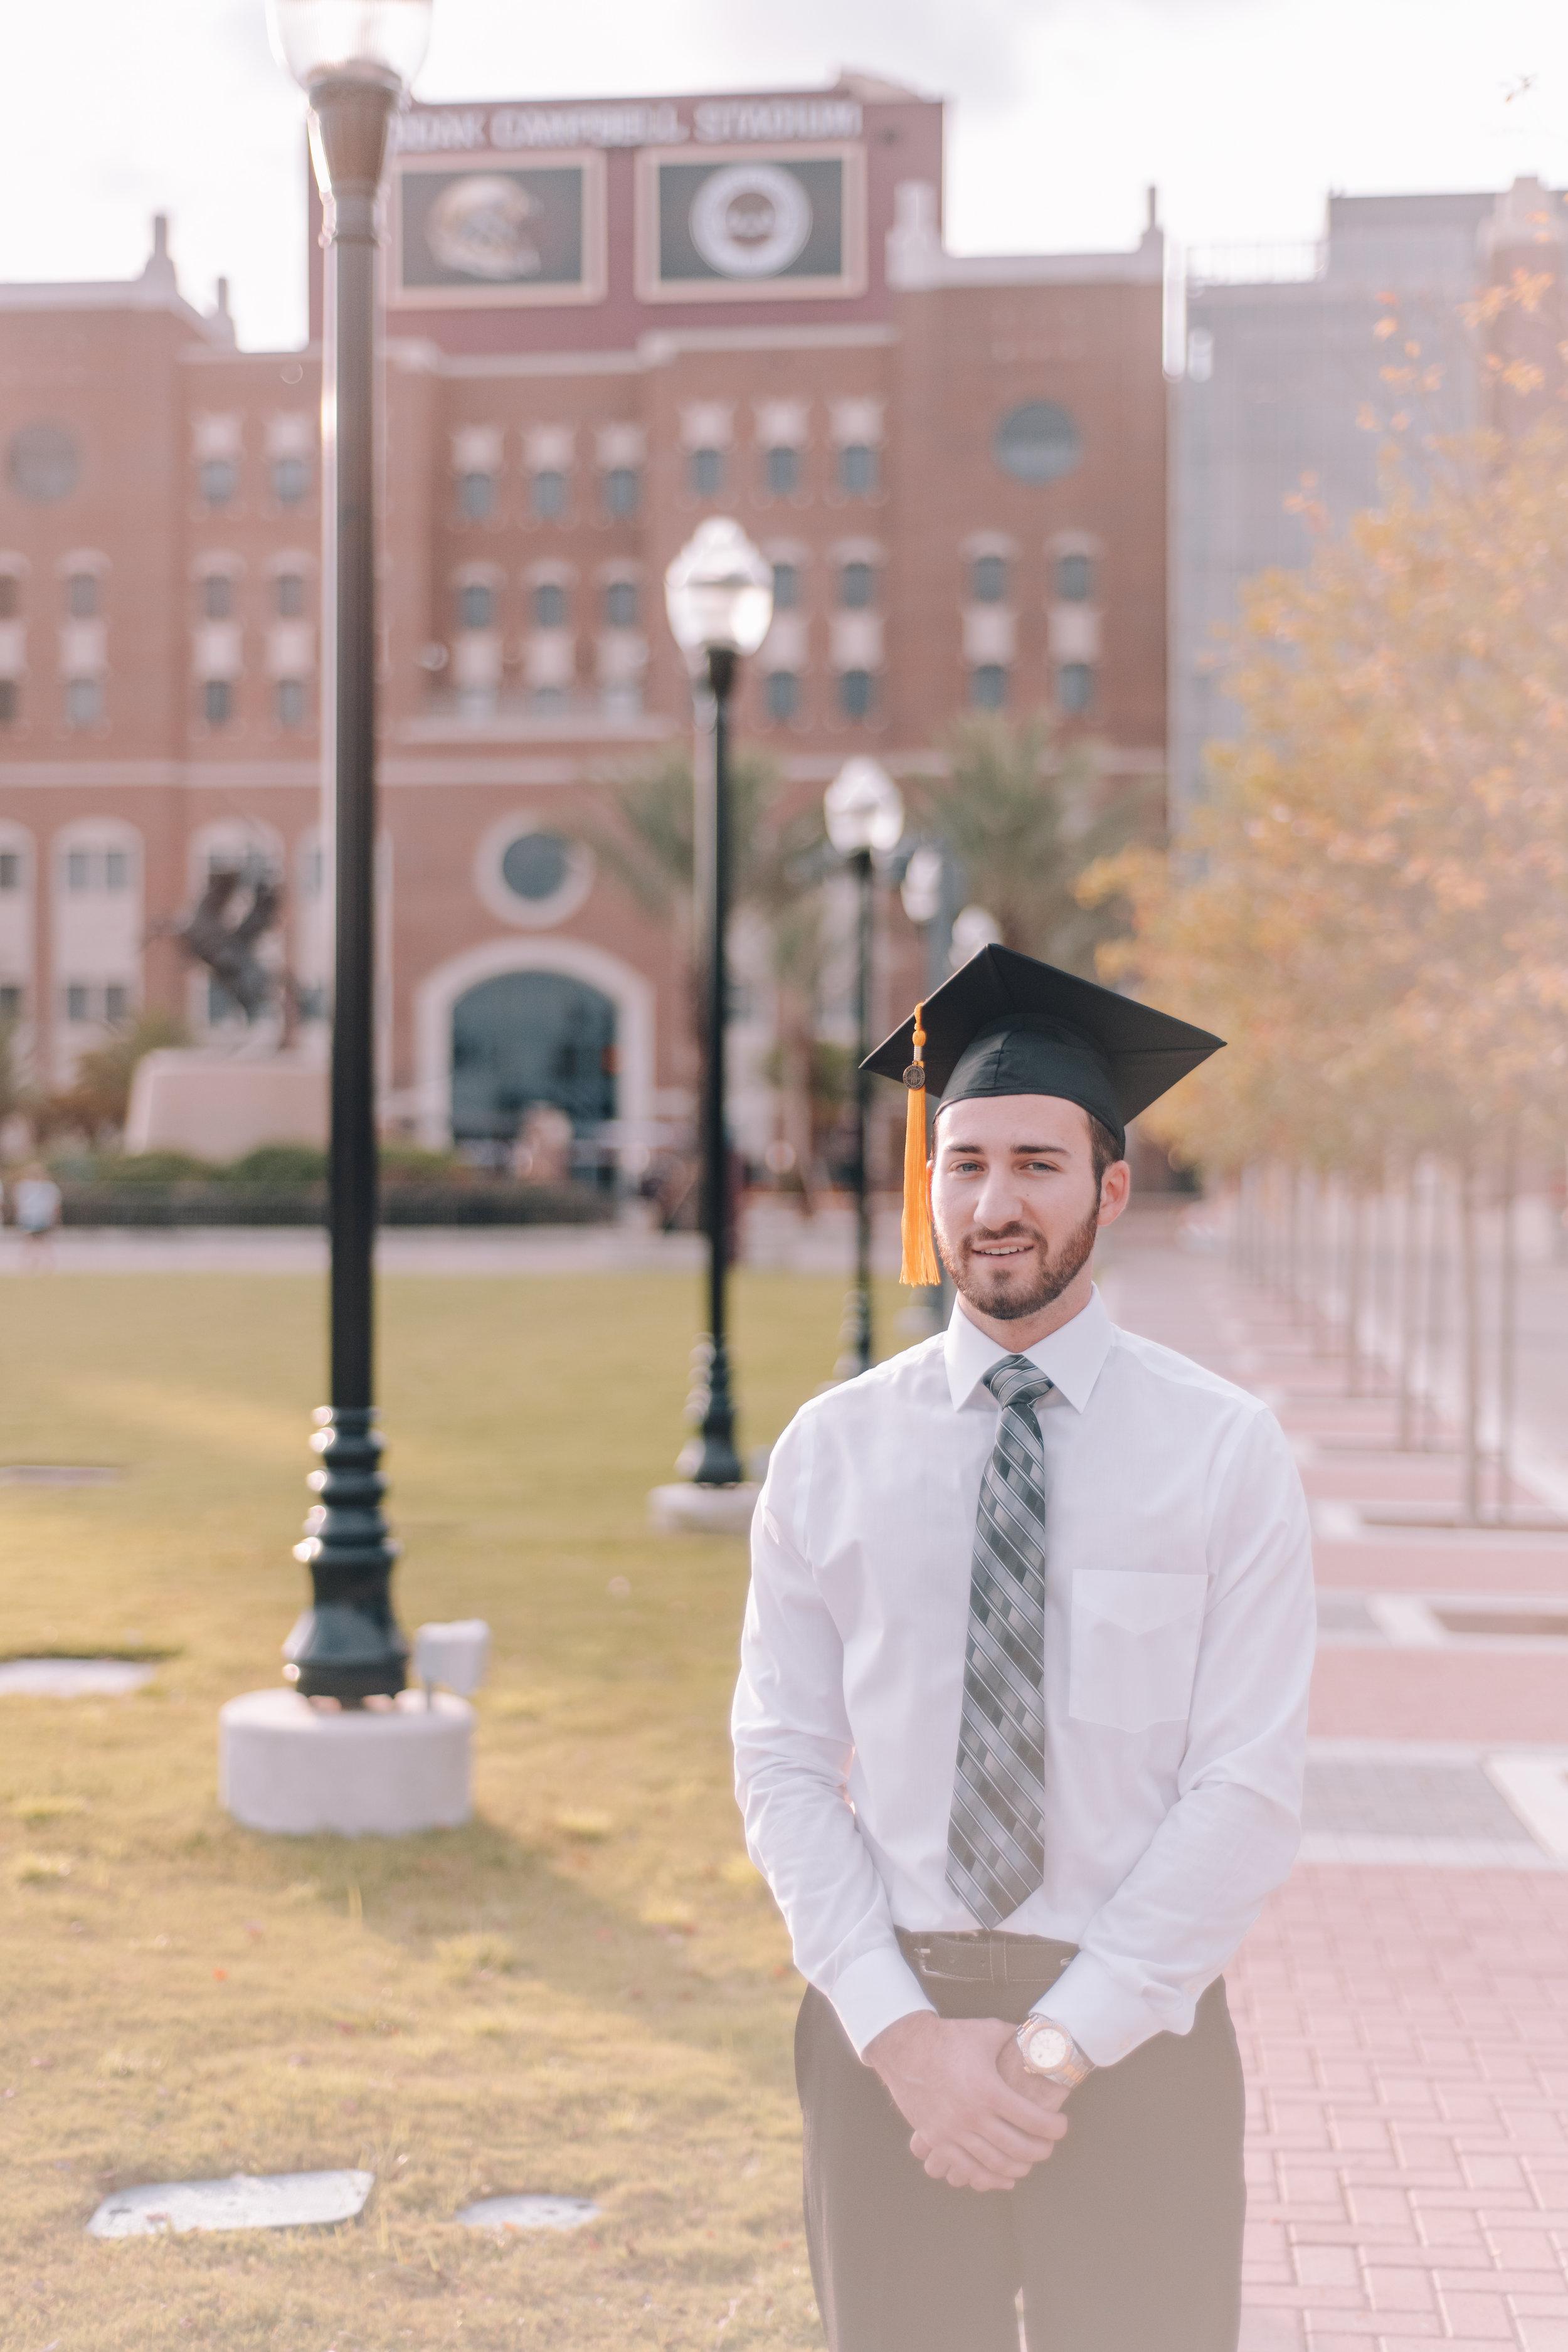 Graduation Photo.TolchinPhoto.jpg